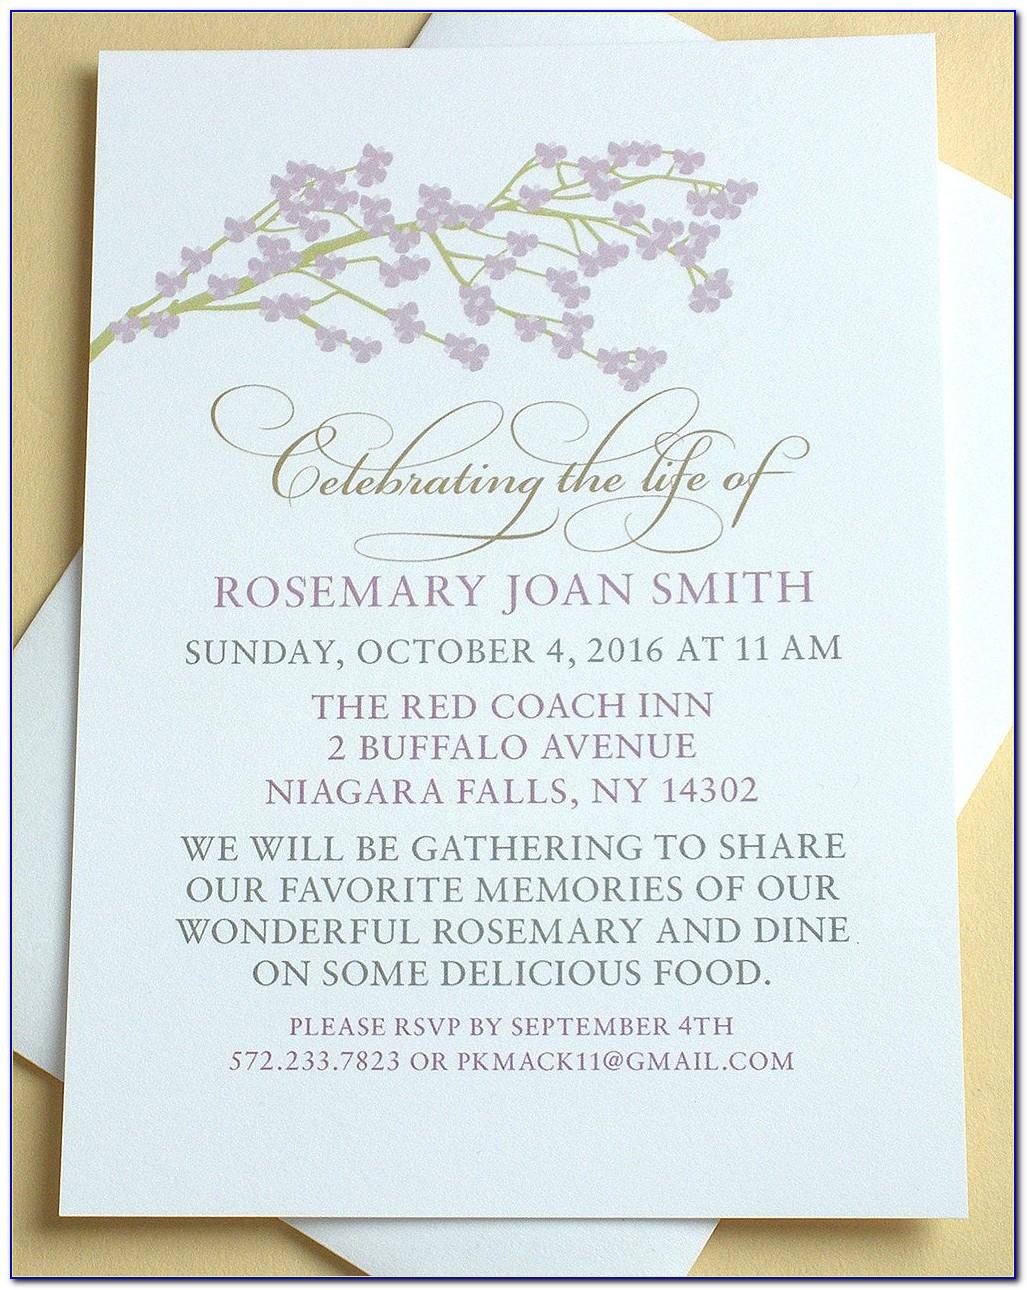 Celebration Invitations Templates Free